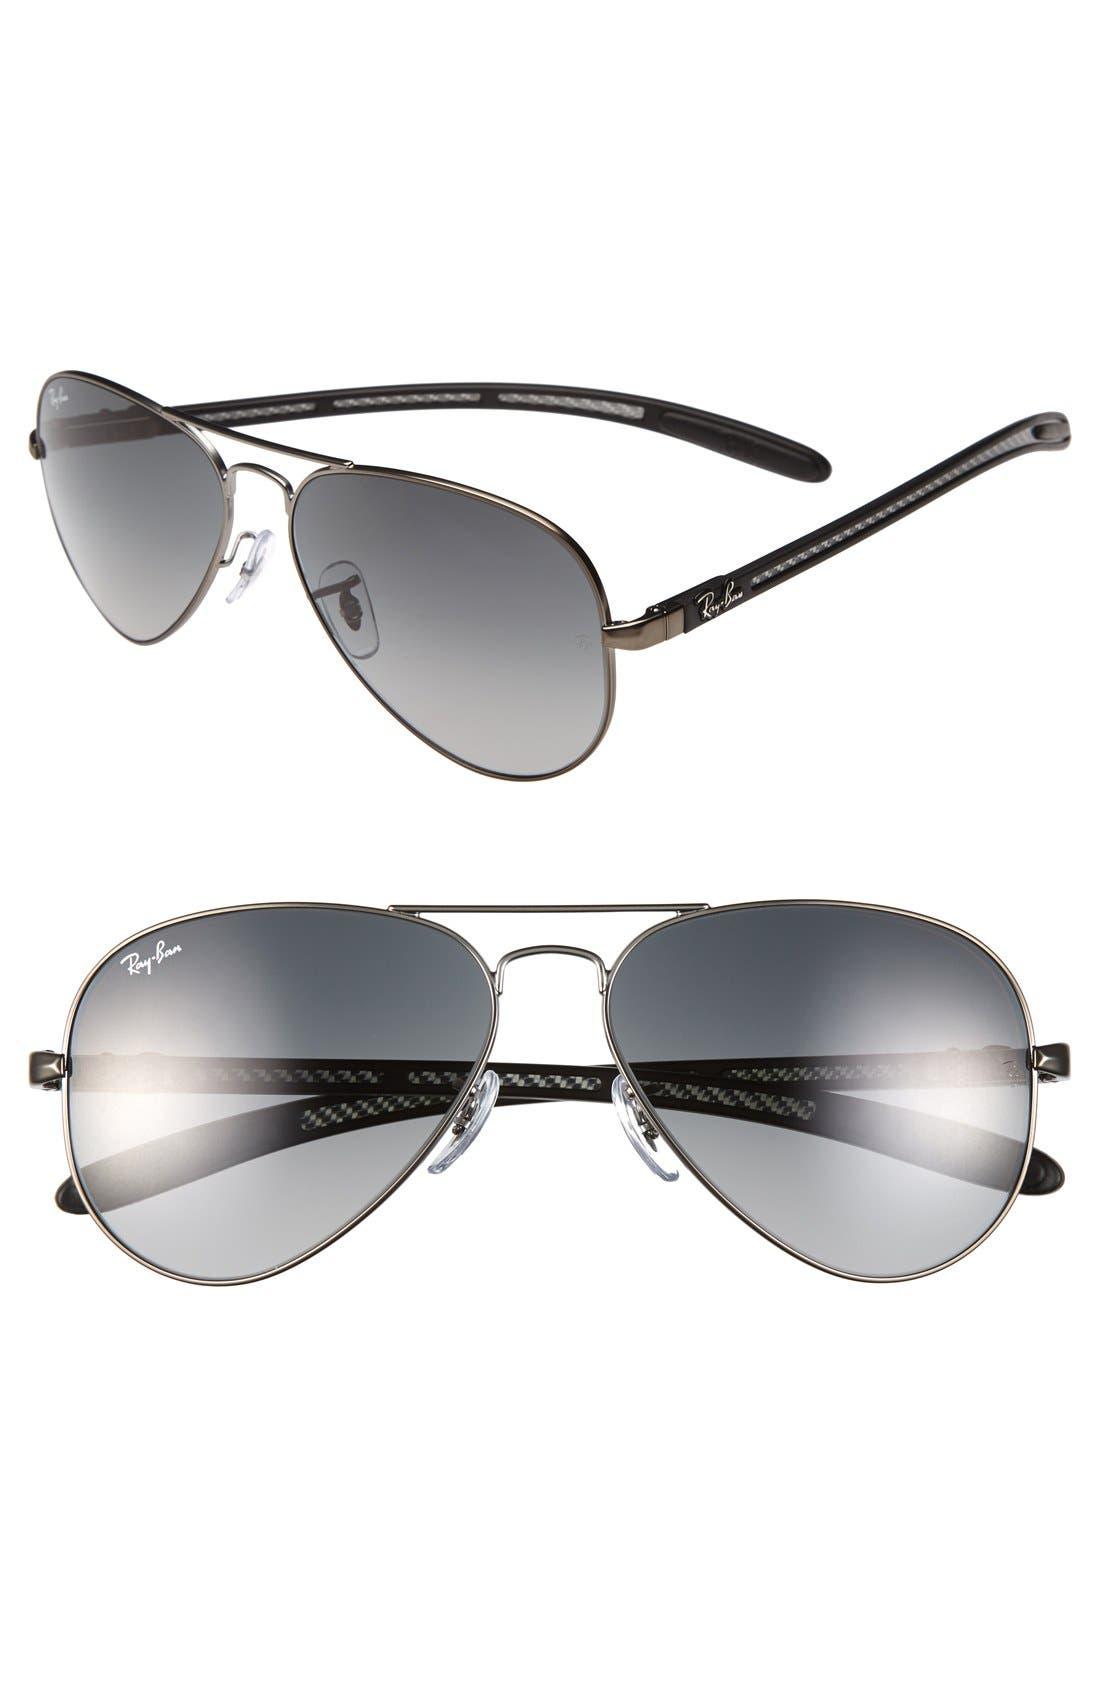 Alternate Image 1 Selected - Ray-Ban 'TECH Carbon Fiber' 58mm Aviator Sunglasses